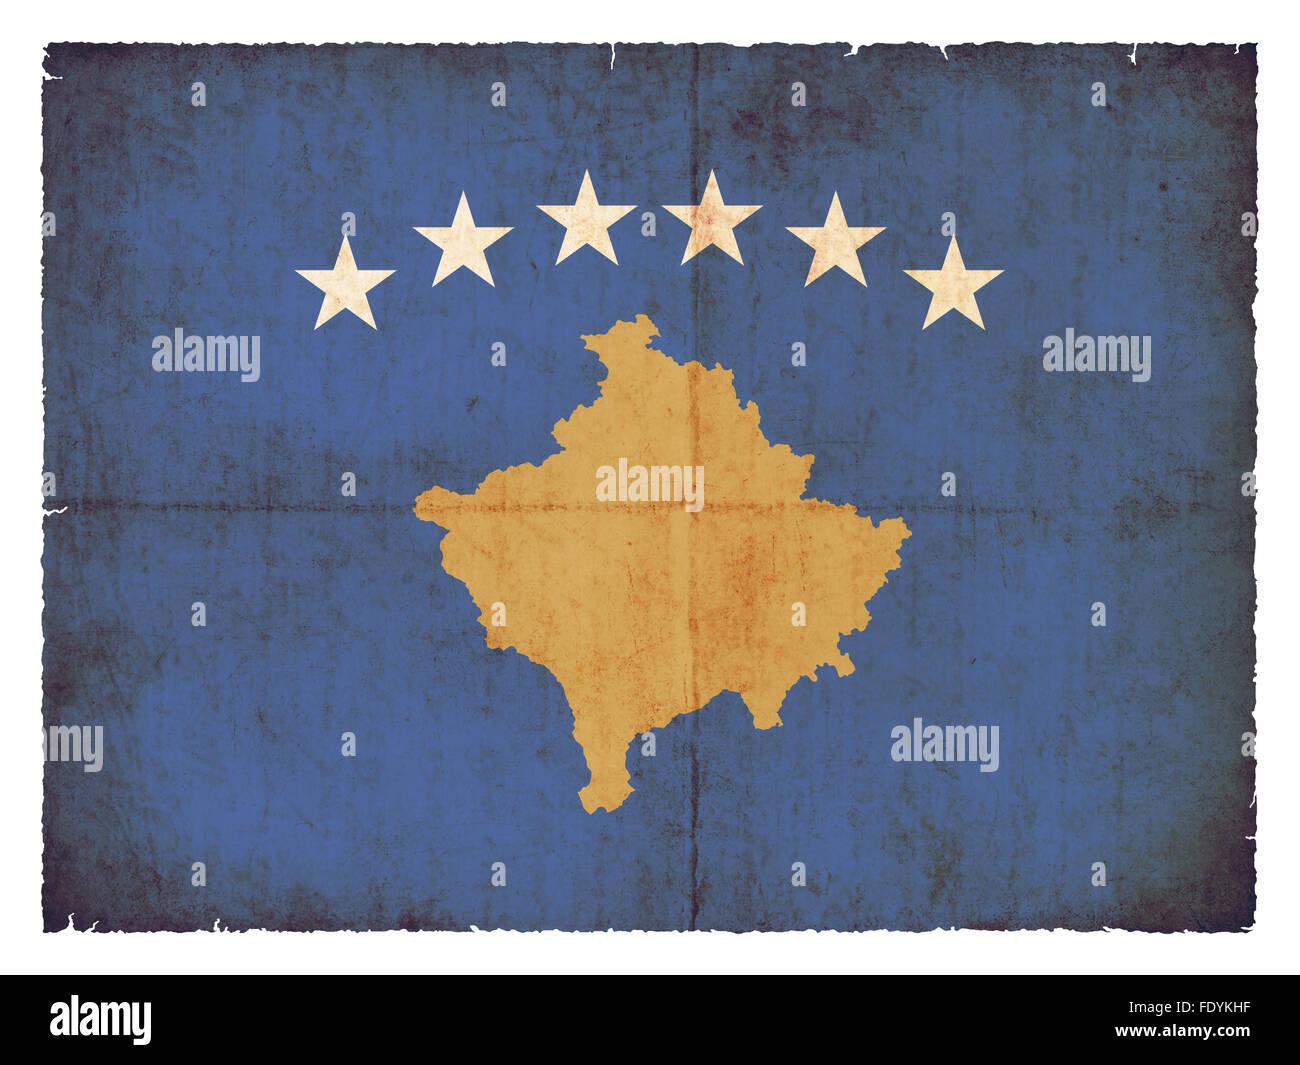 National Flag of Kosovo created in grunge style - Stock Image